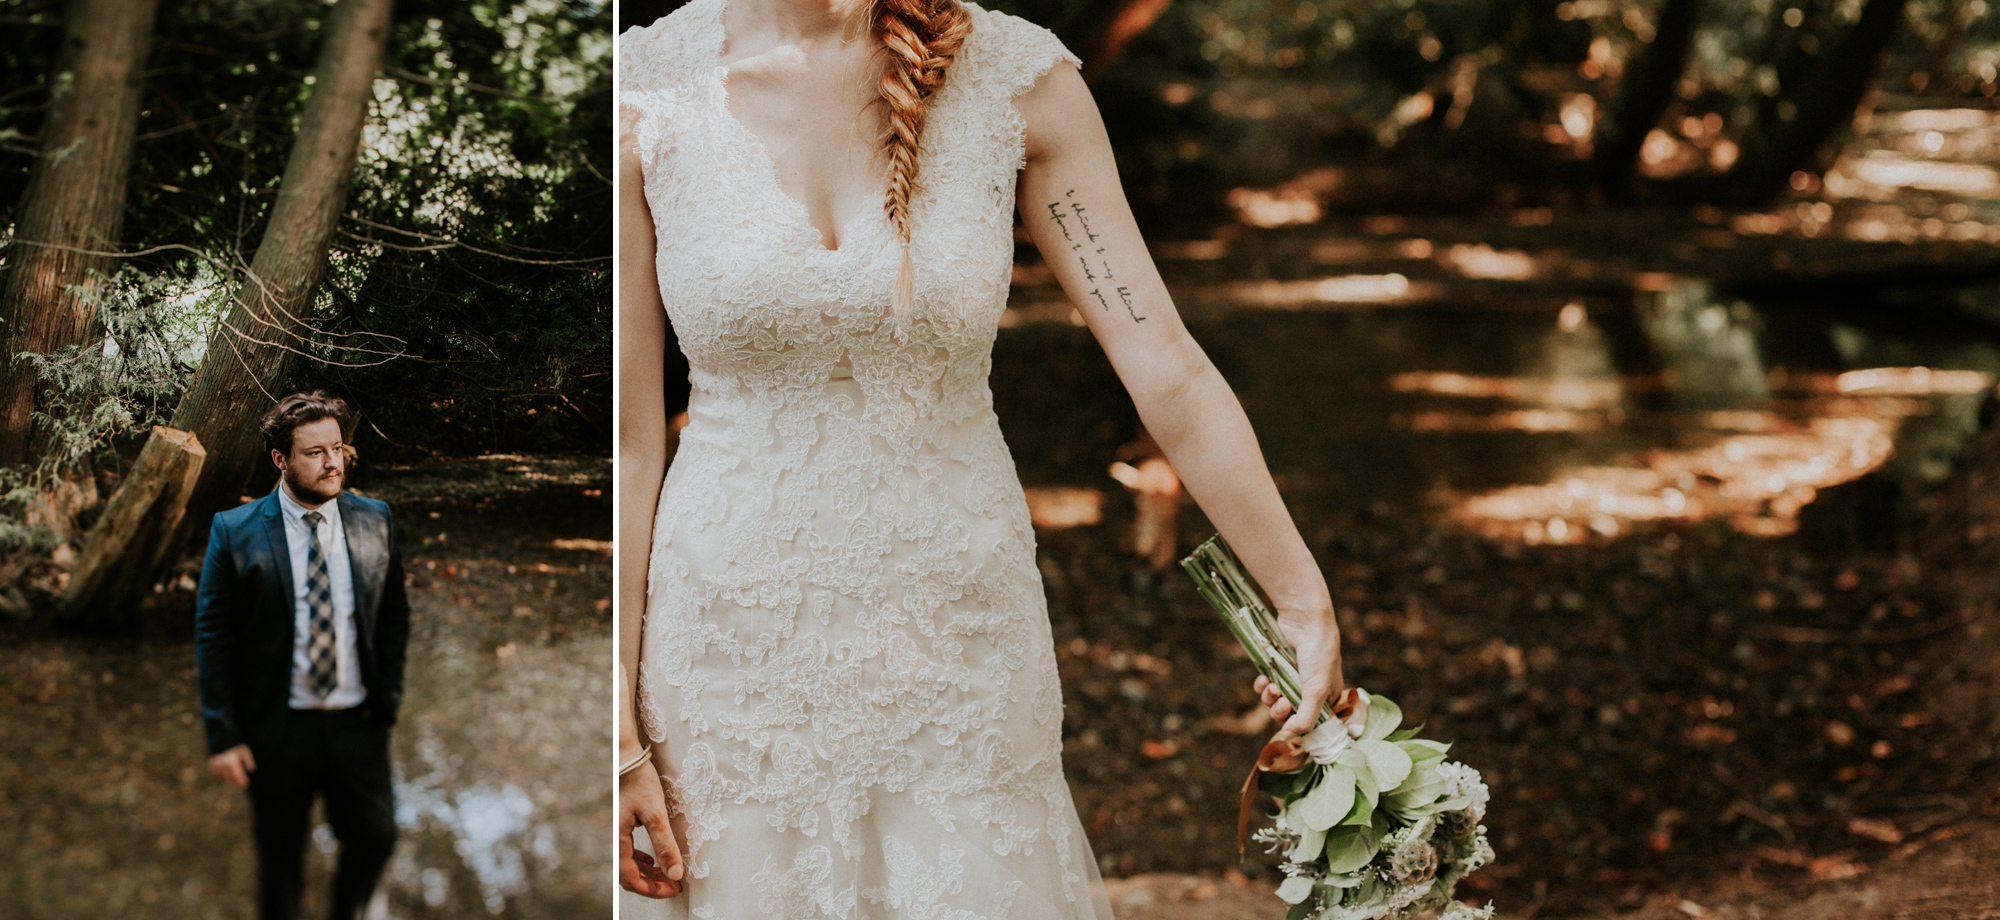 859-abbotsford-wedding-photographer